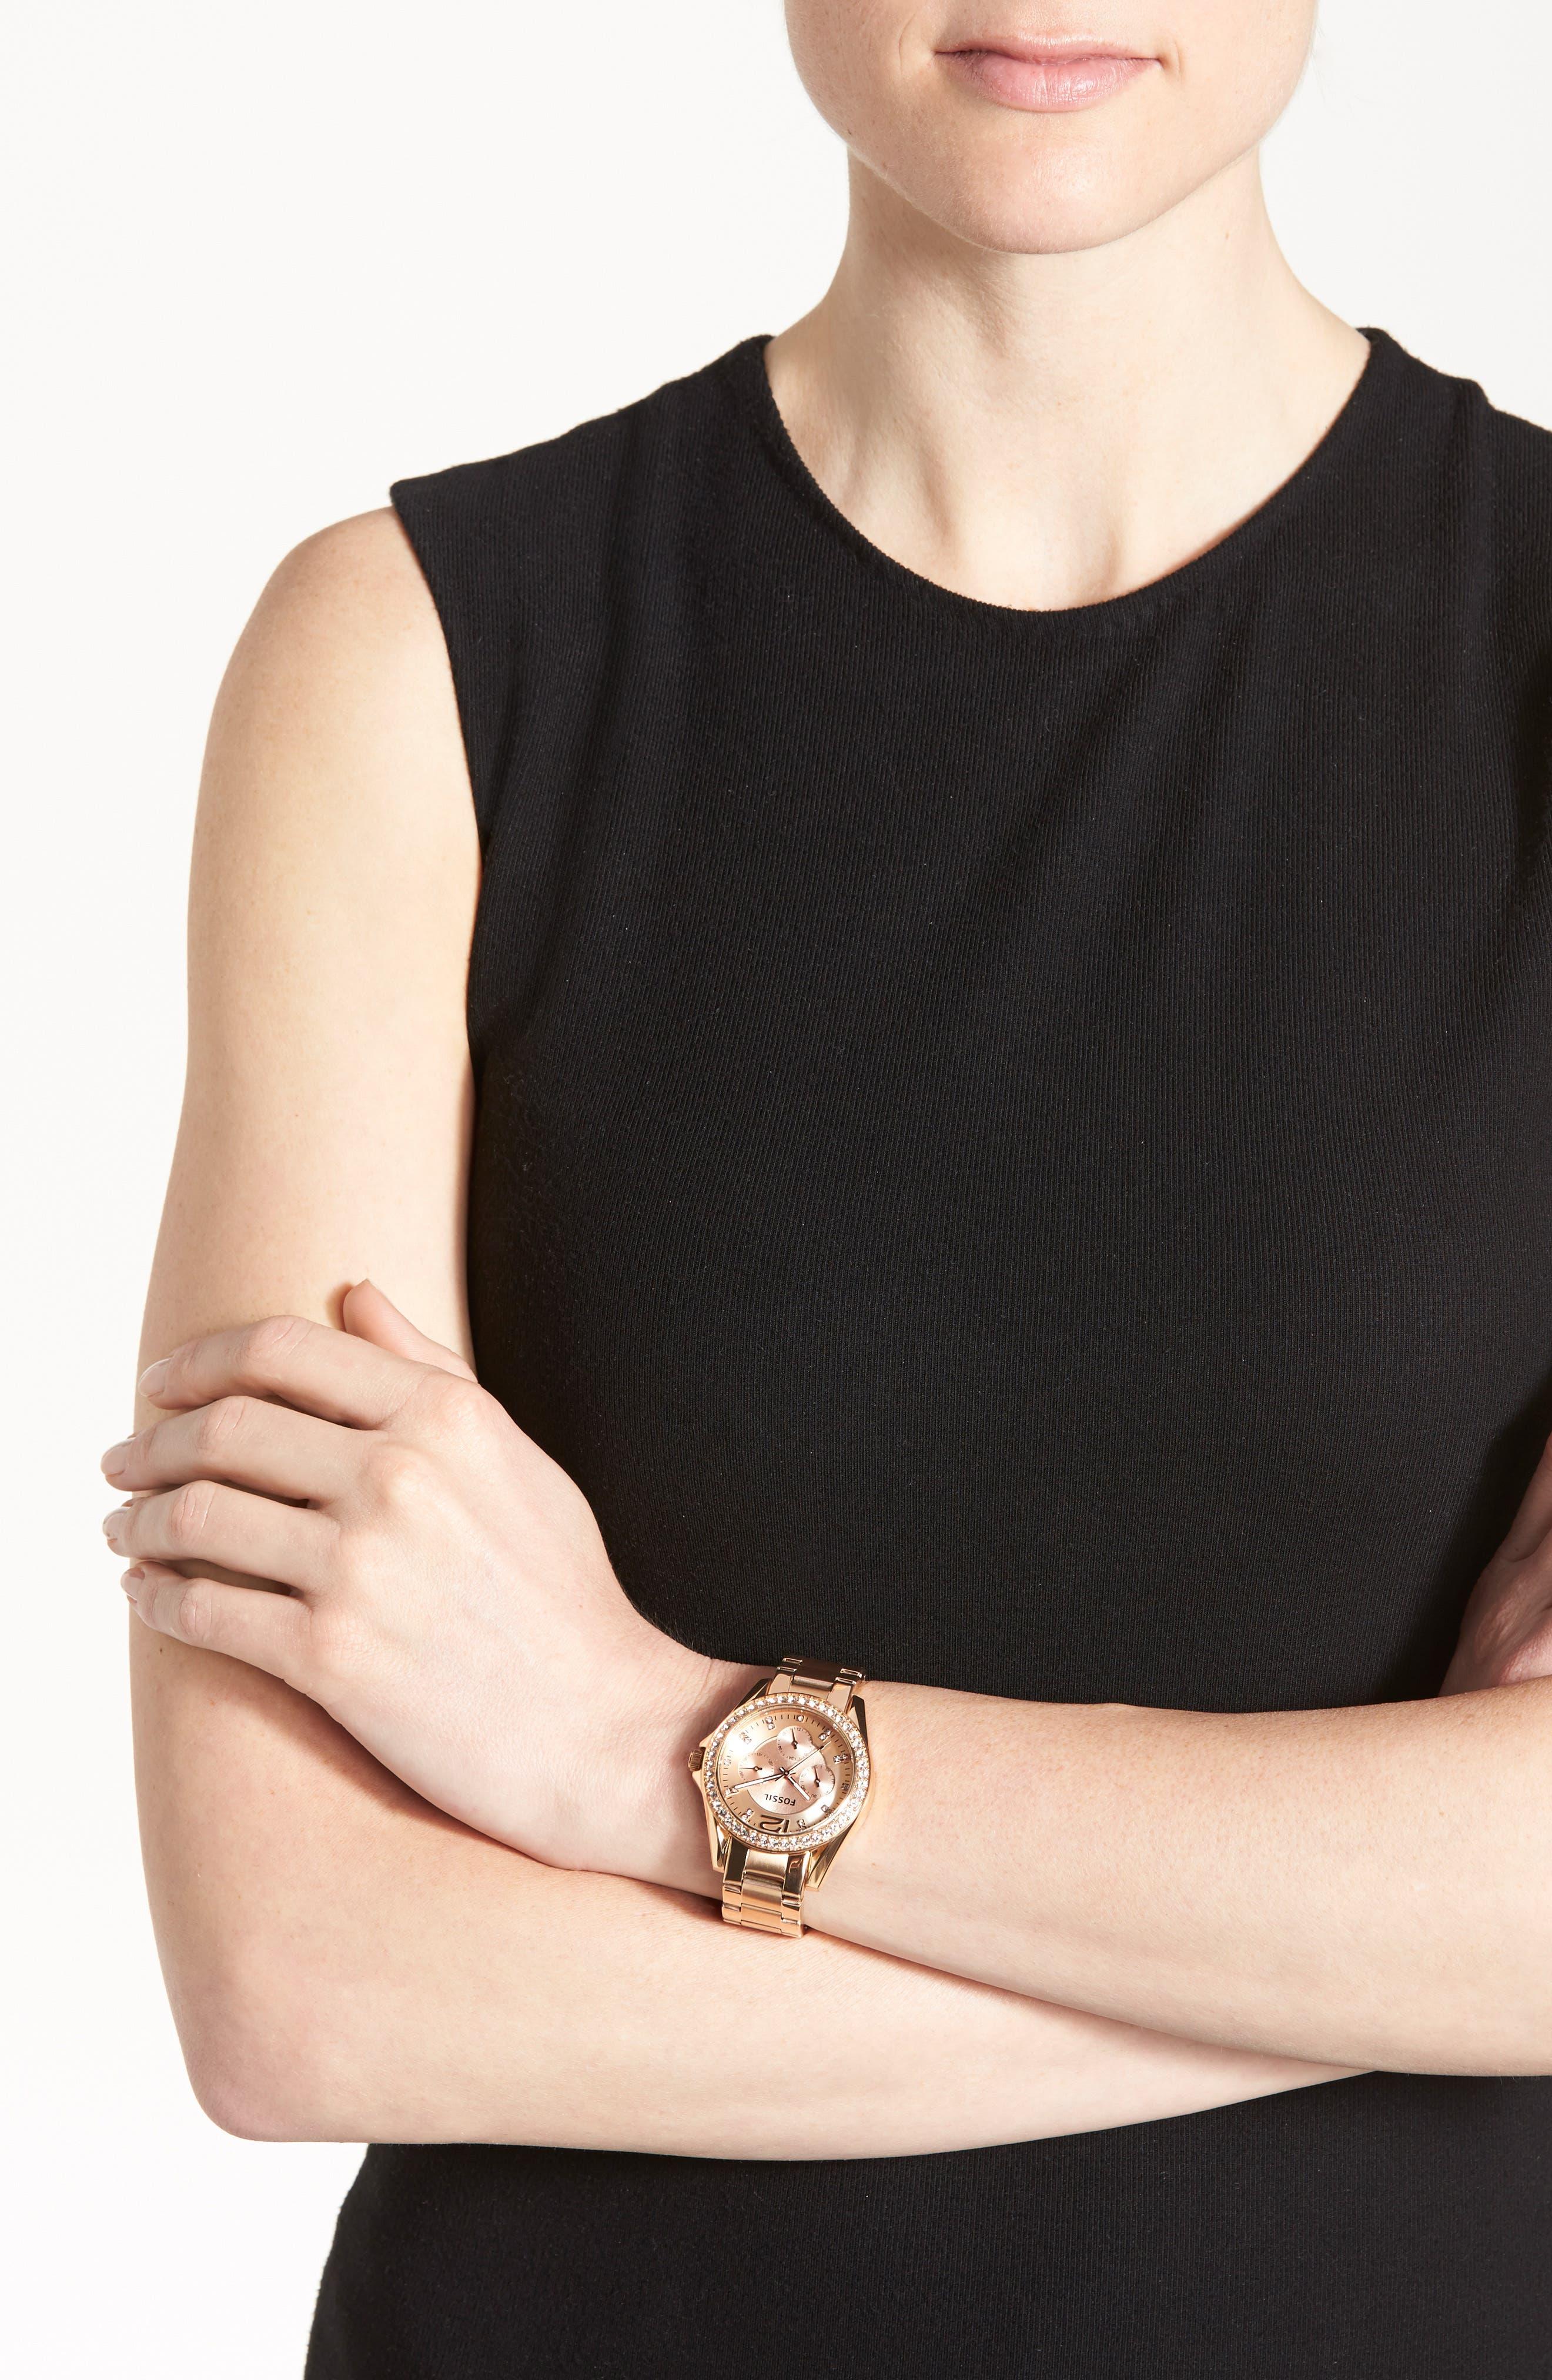 FOSSIL, 'Riley' Round Crystal Bezel Bracelet Watch, 38mm, Alternate thumbnail 5, color, ROSE GOLD